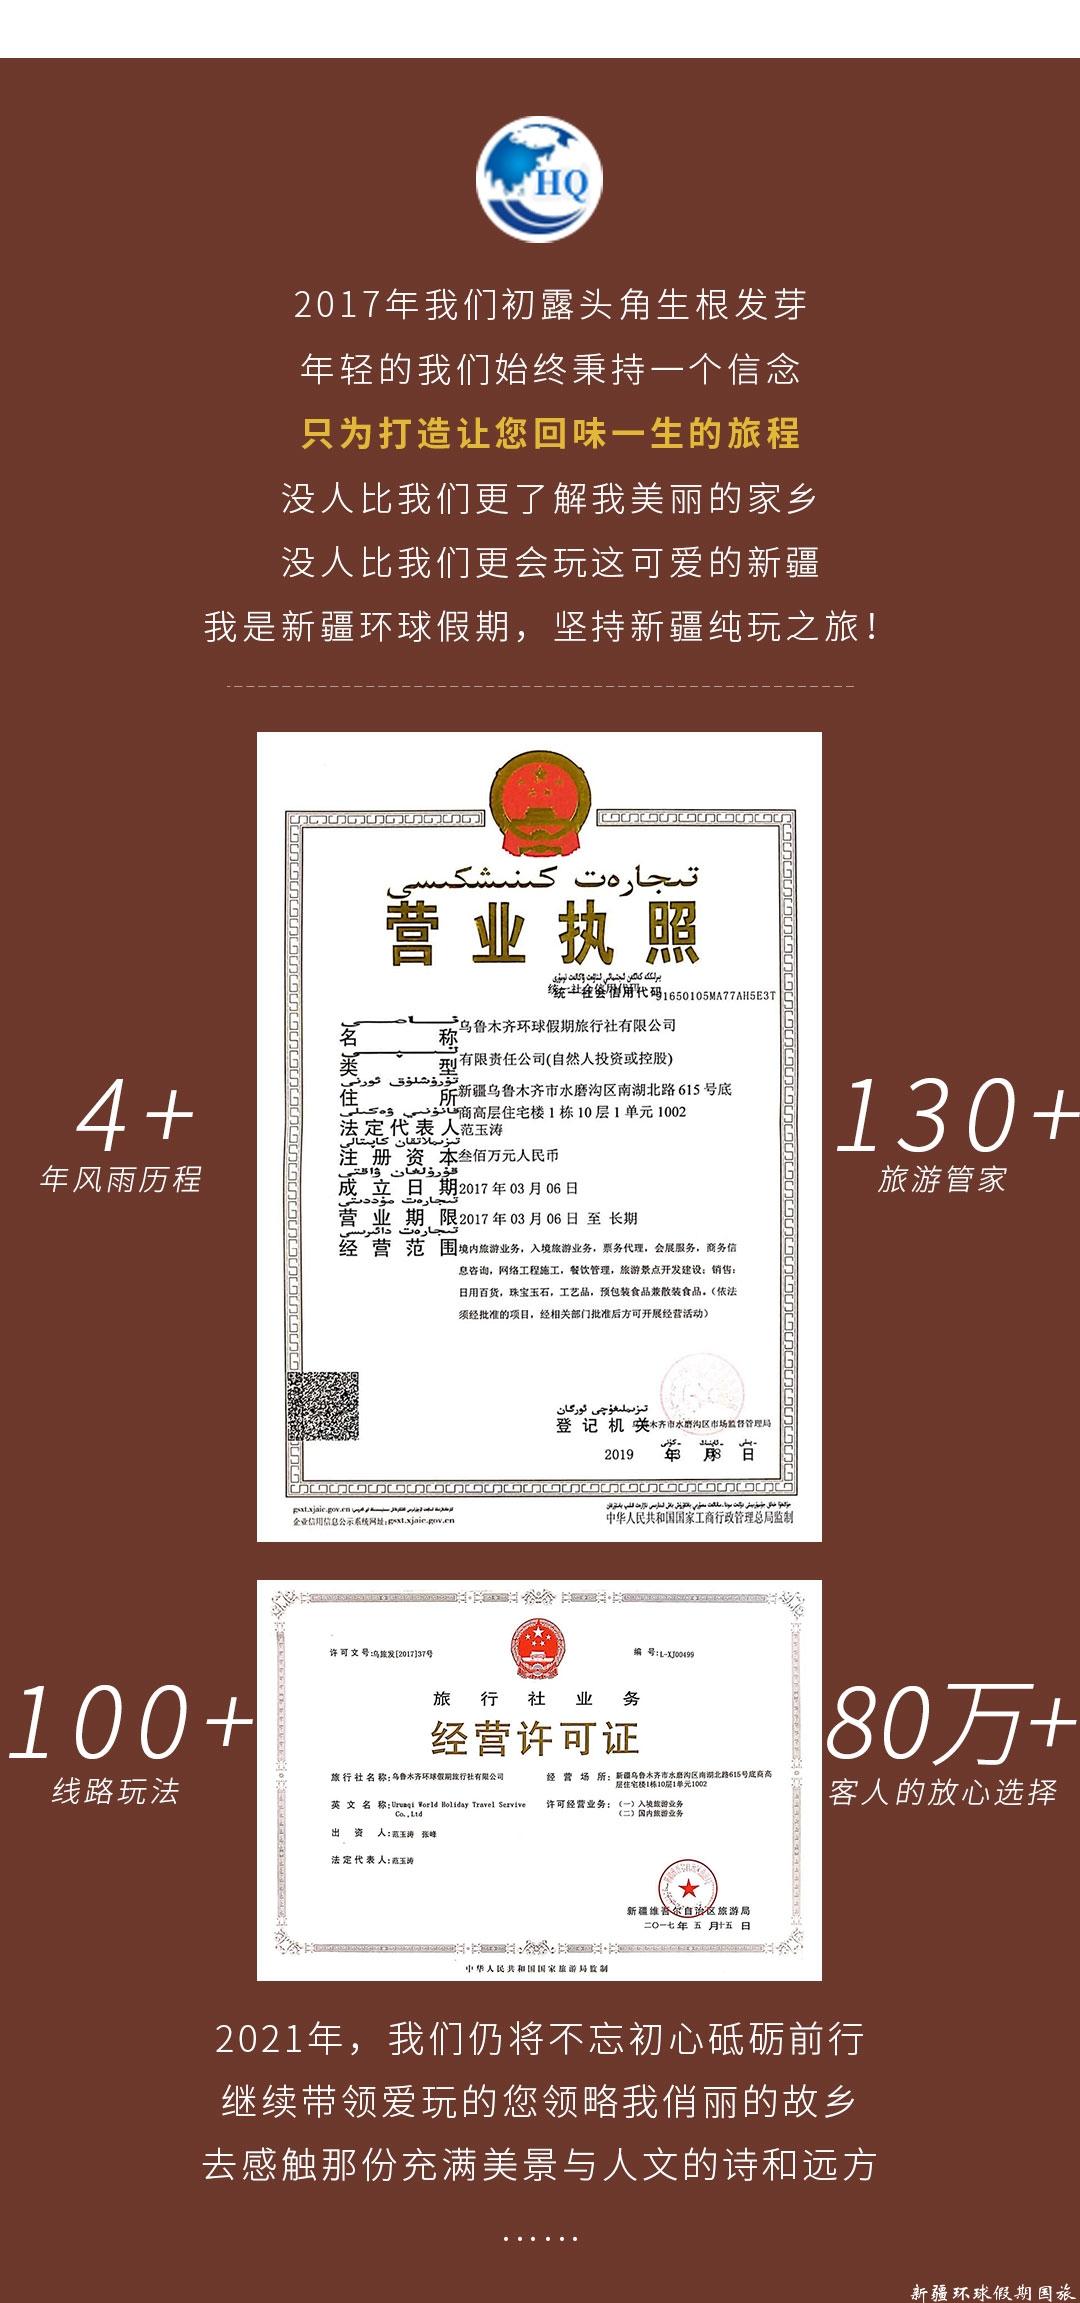 B1-HQB-004+1_13